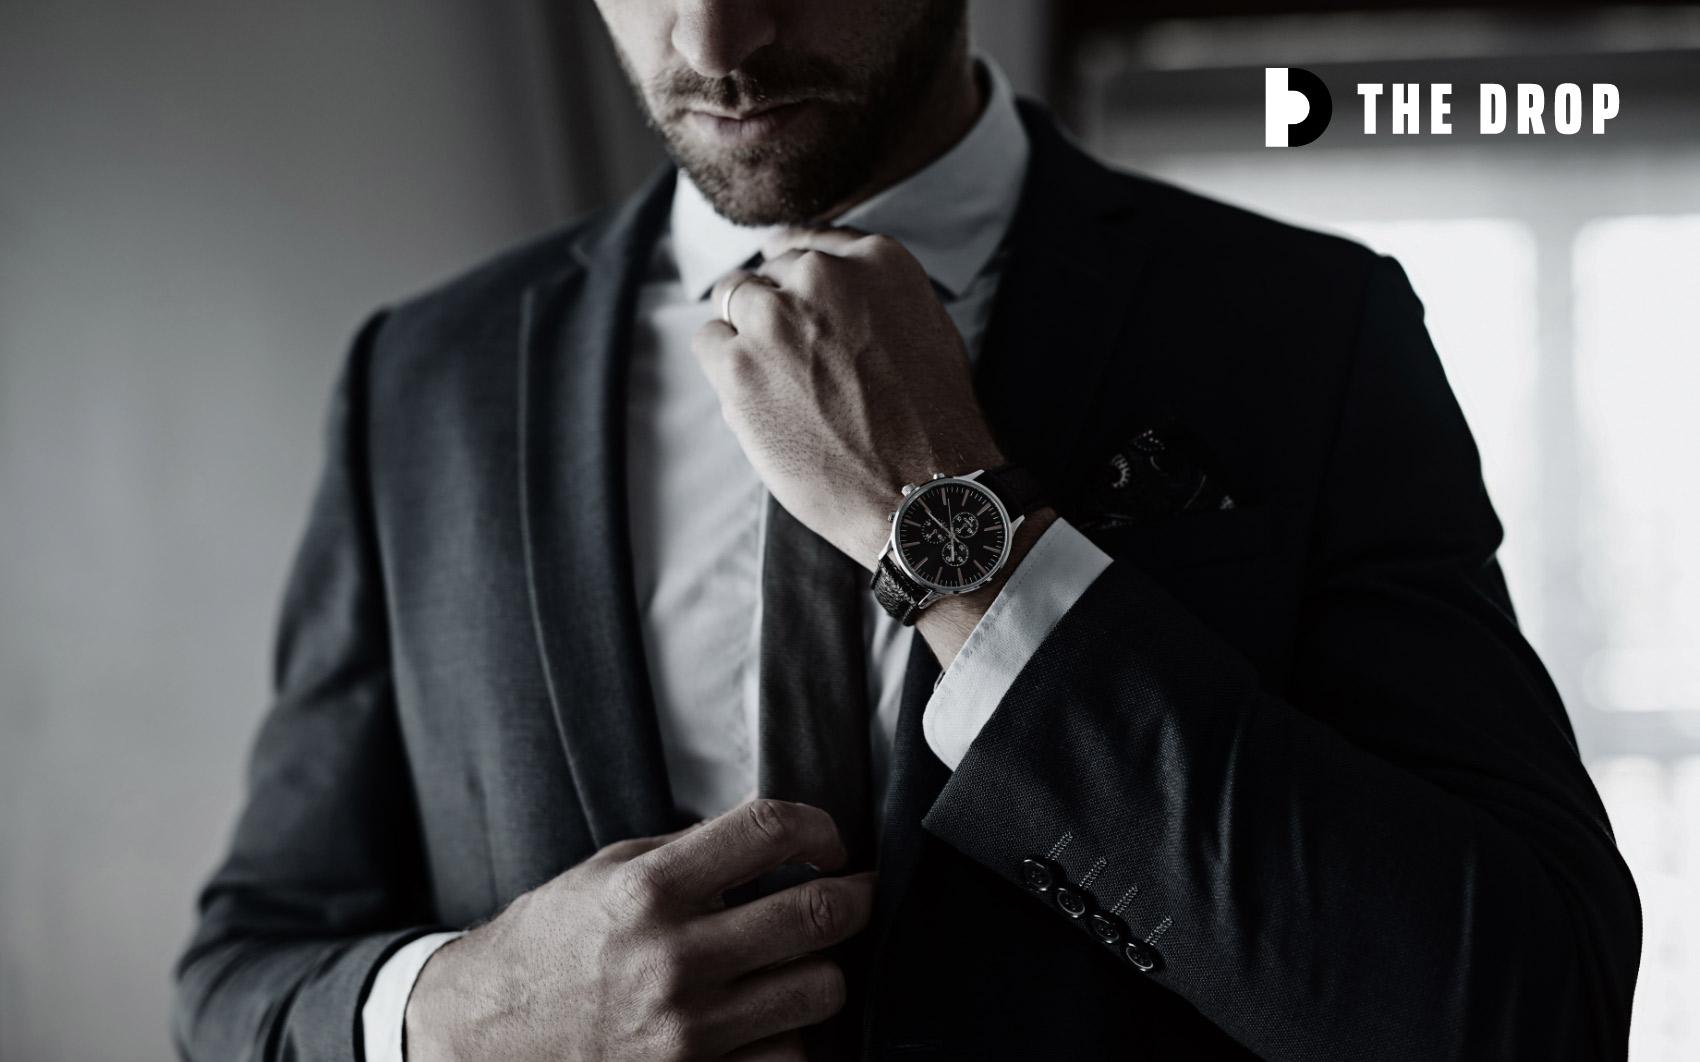 Man in suit adjusting tie with logo